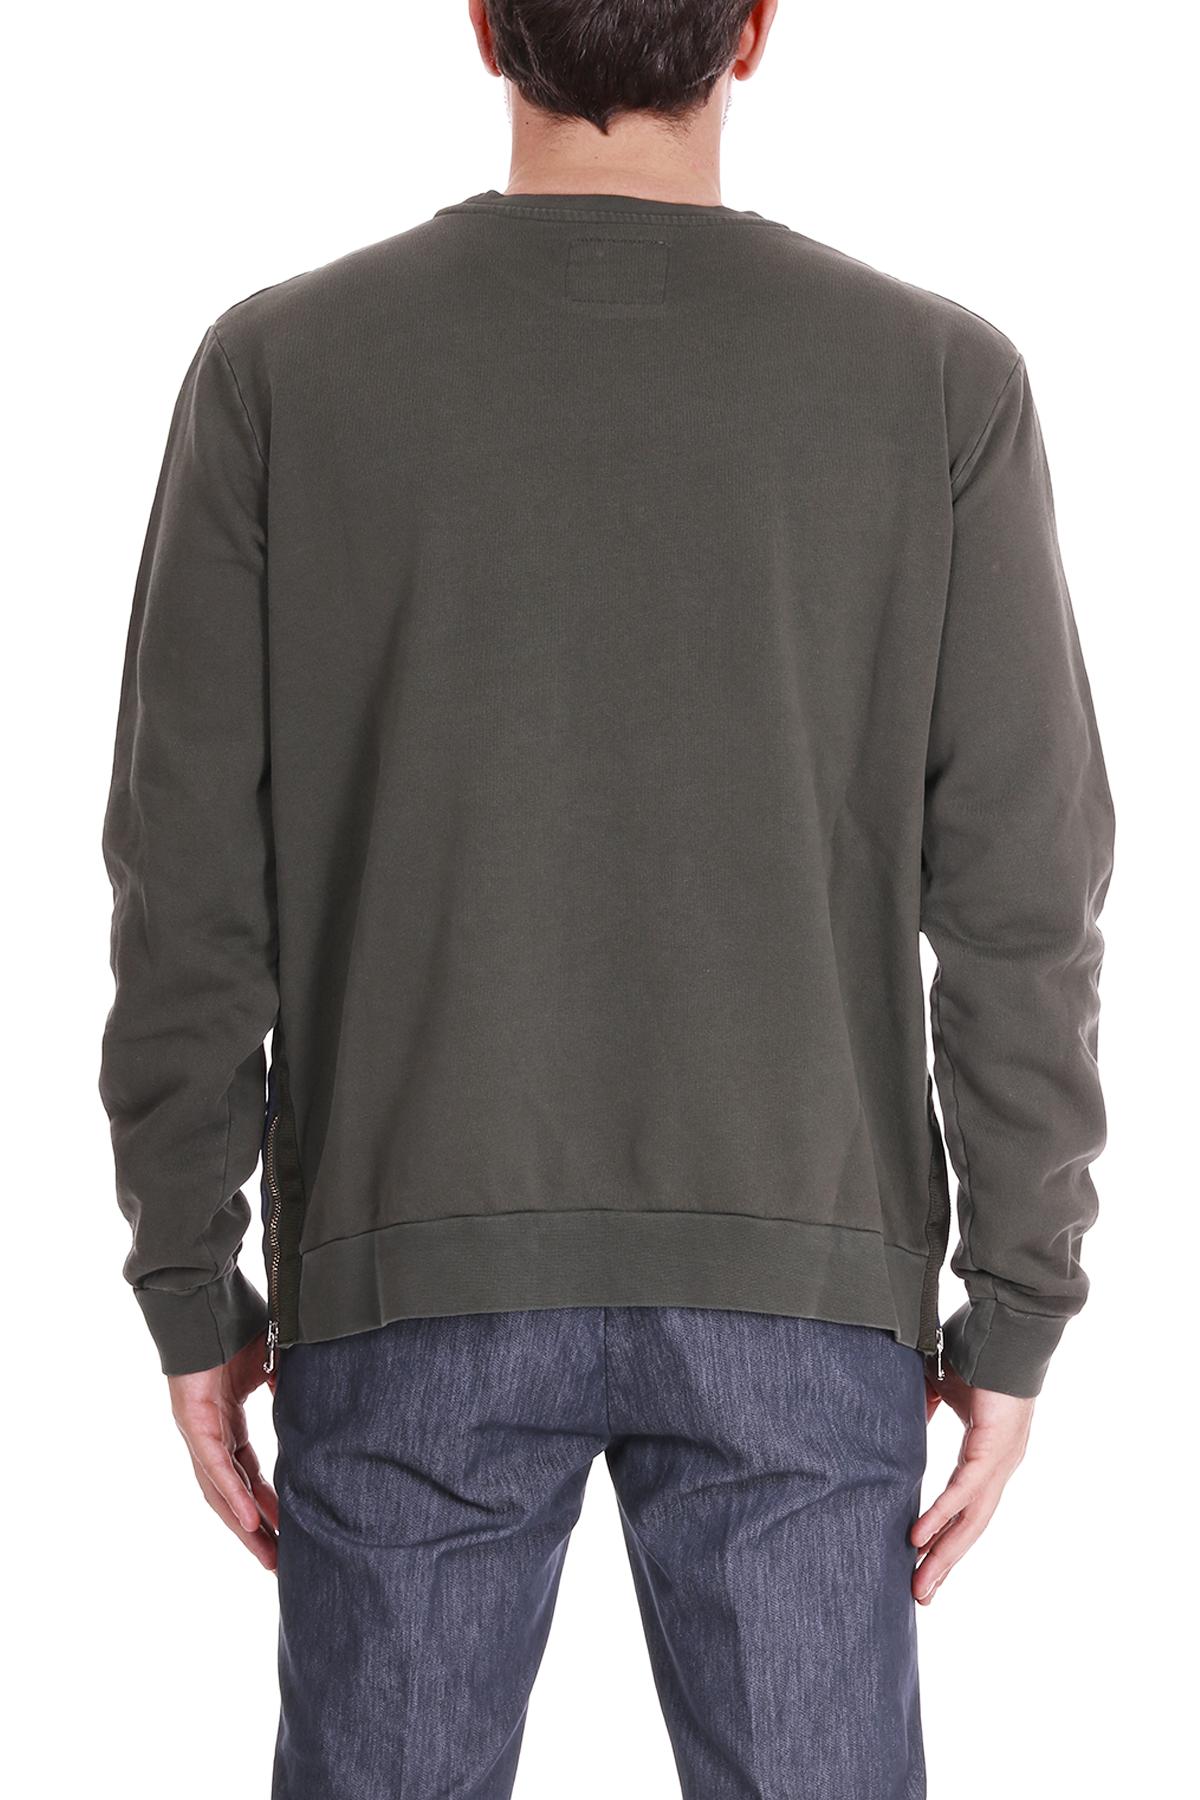 COTTON SWEATSHIRT WITH ZIP THE EDITOR | Sweatshirts | E506940T5542157